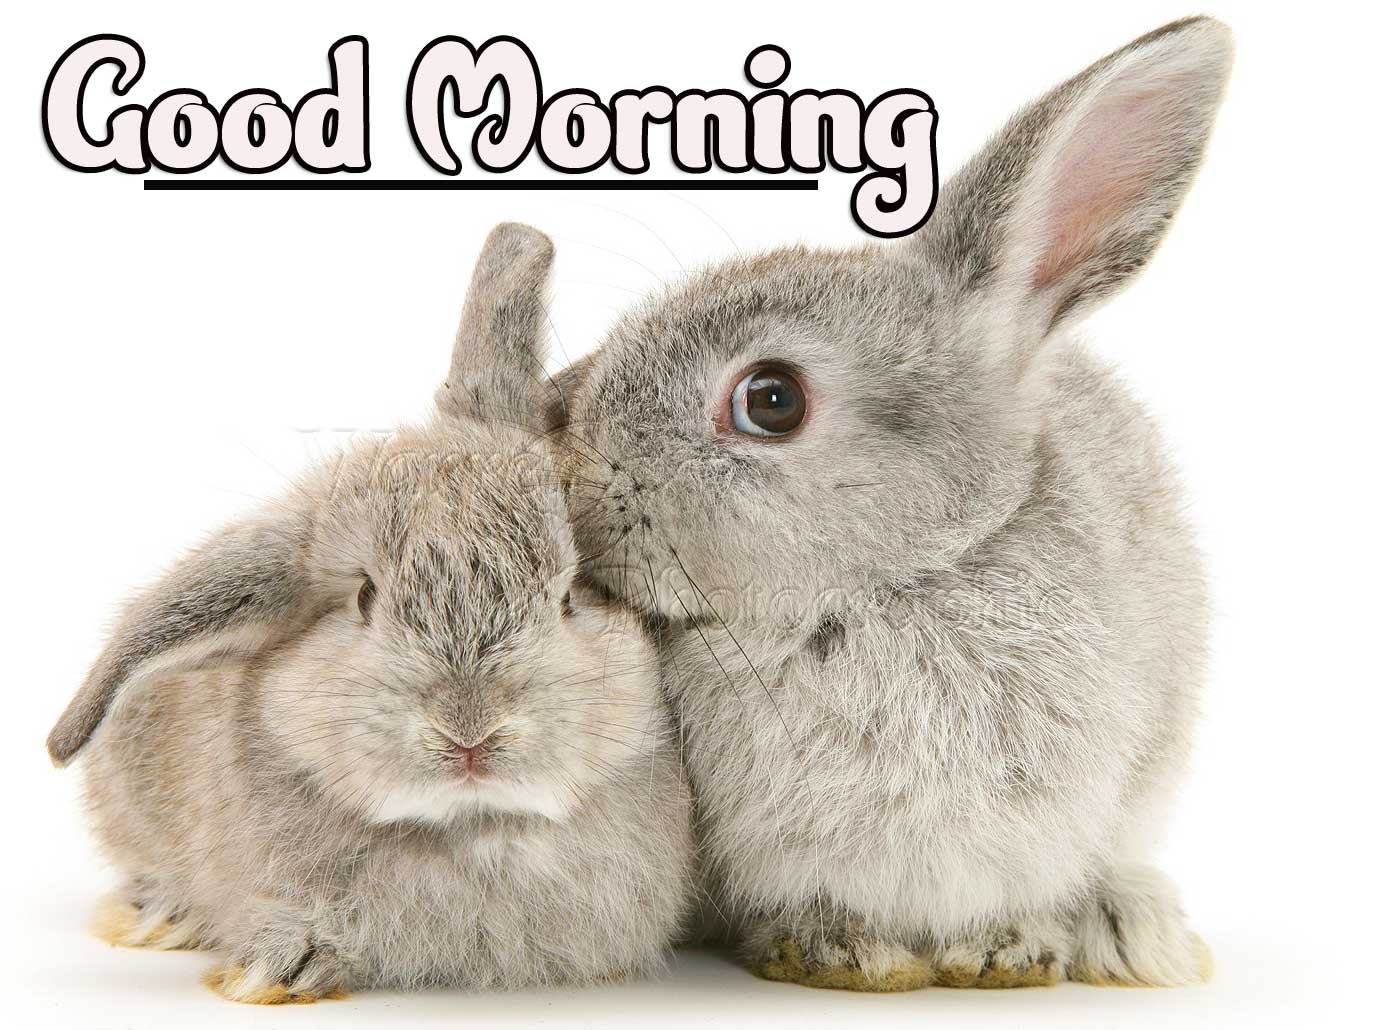 Animal Bird Lion Good Morning Wishes Wallpaper for Facebook